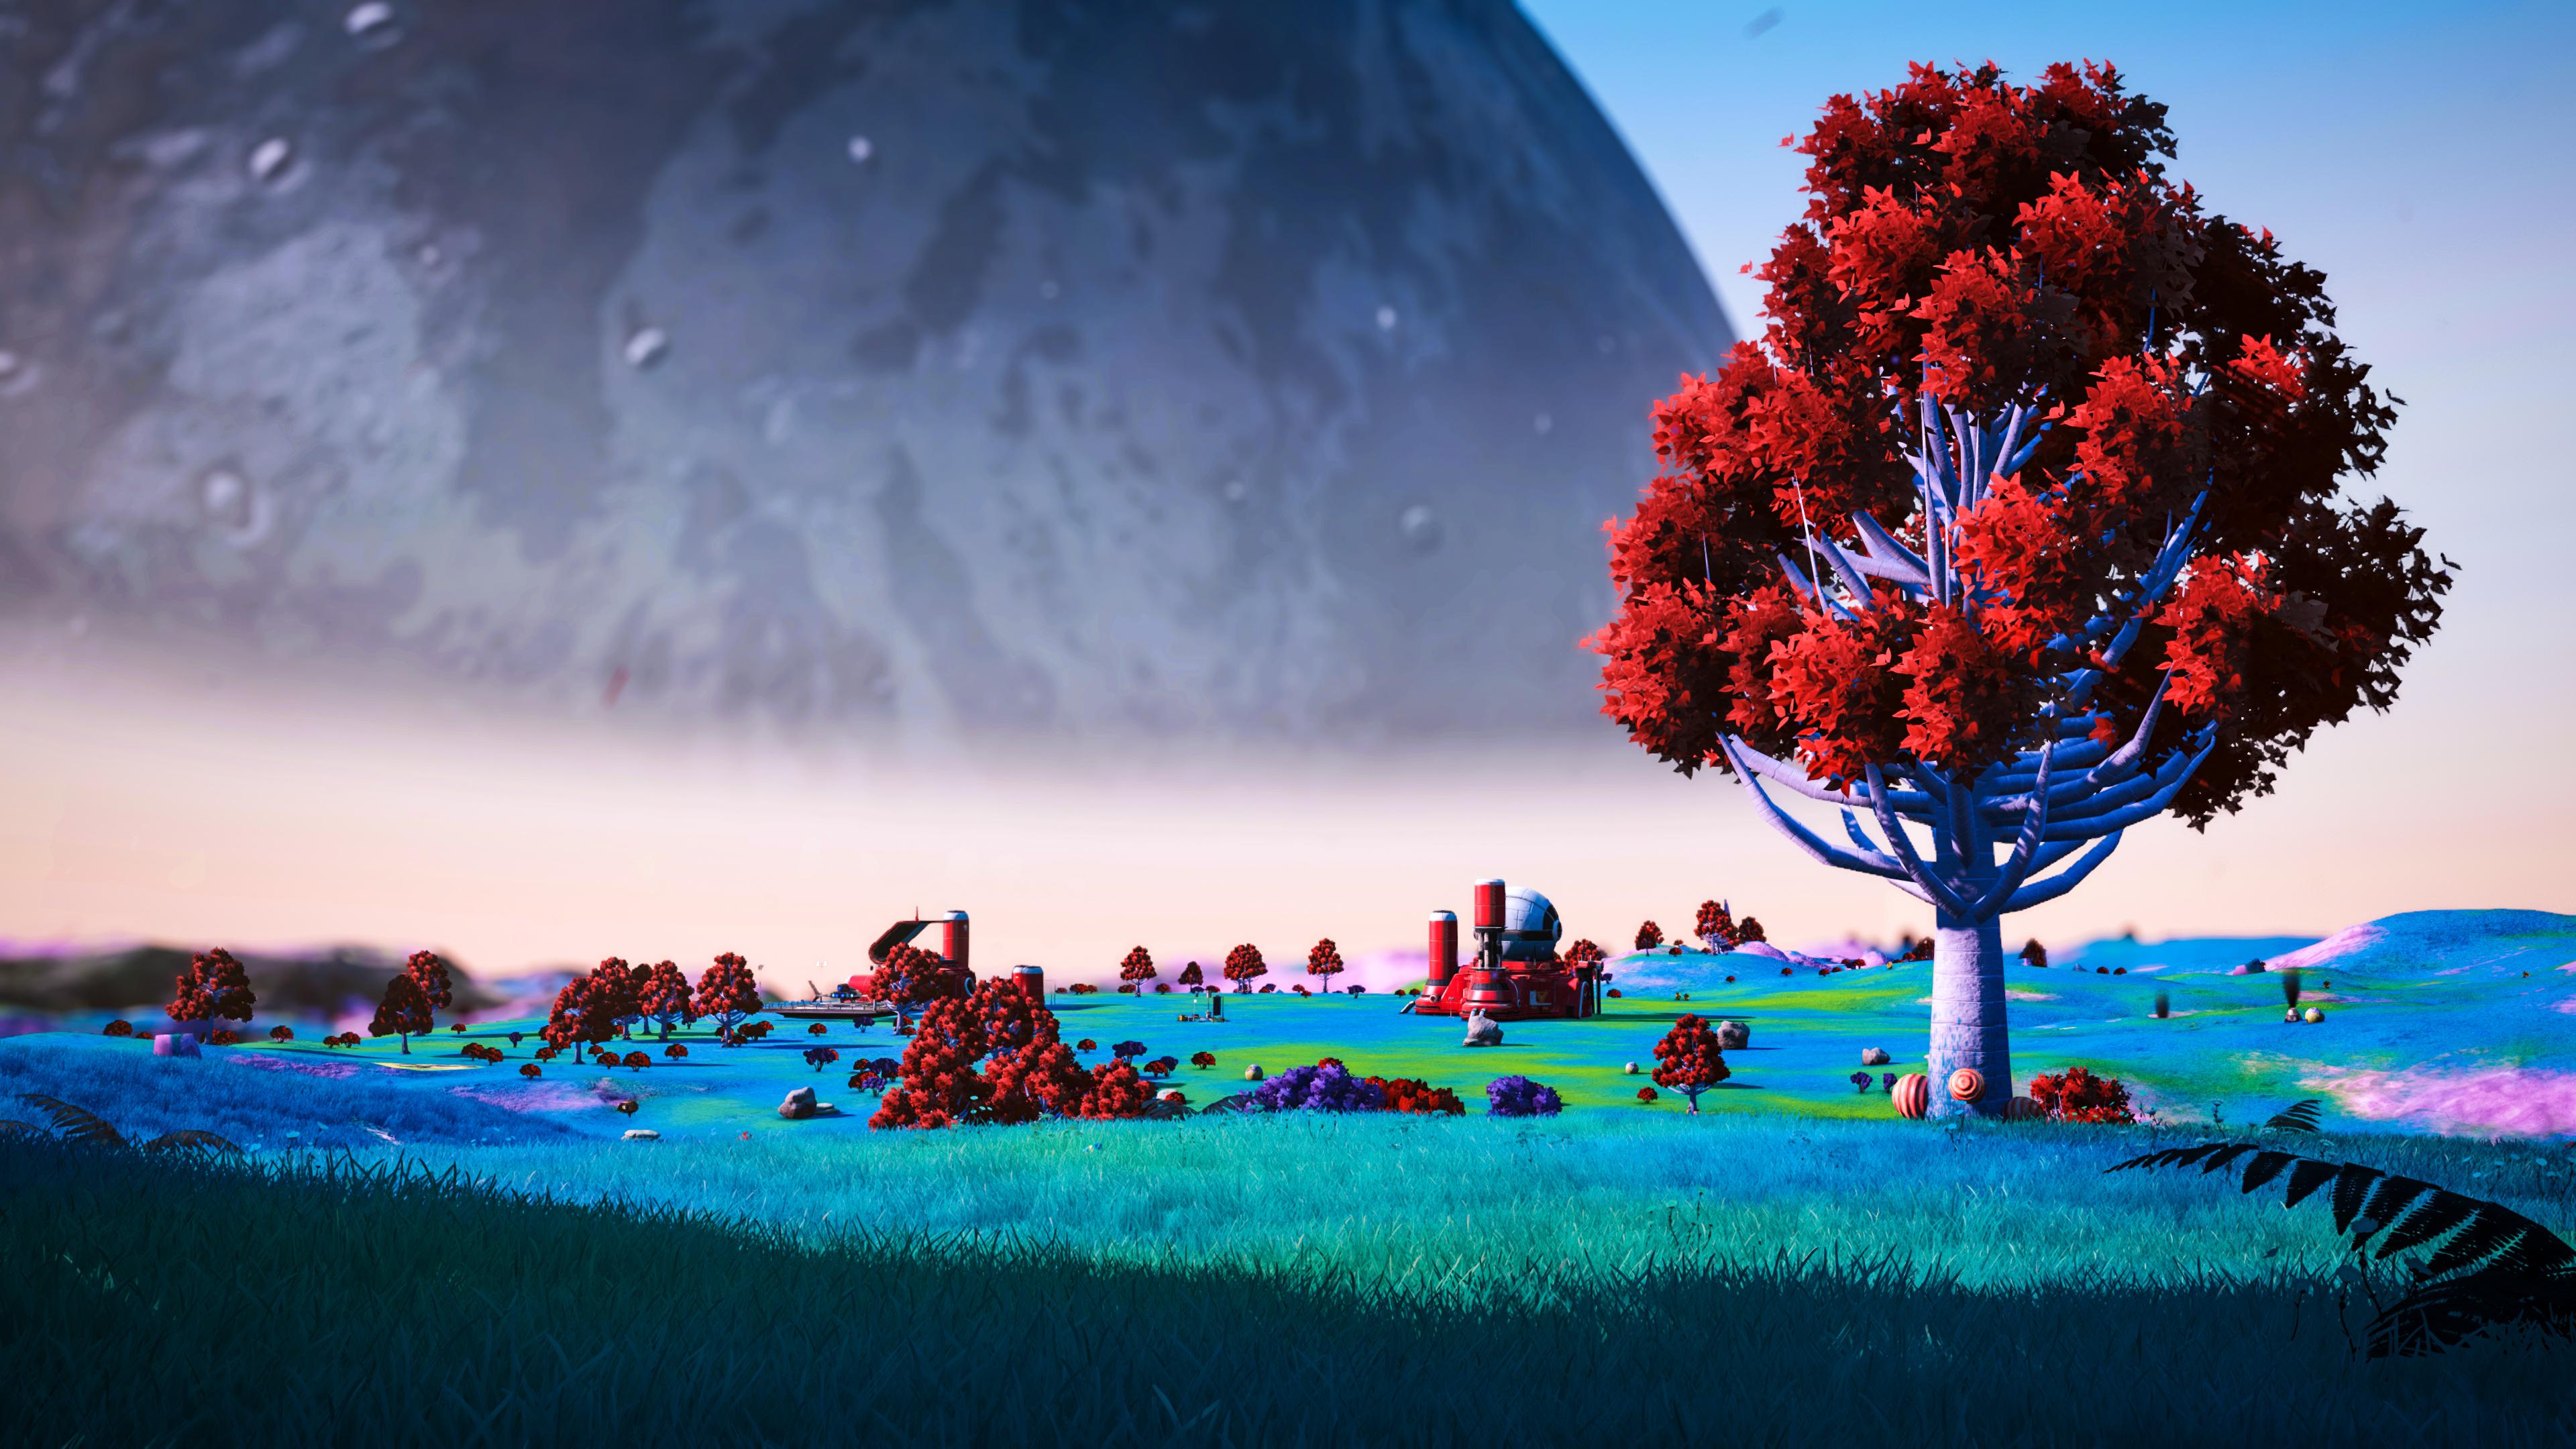 No Man S Sky 4k Wallpaper: No Mans Sky The Next Planet 4k, HD Games, 4k Wallpapers